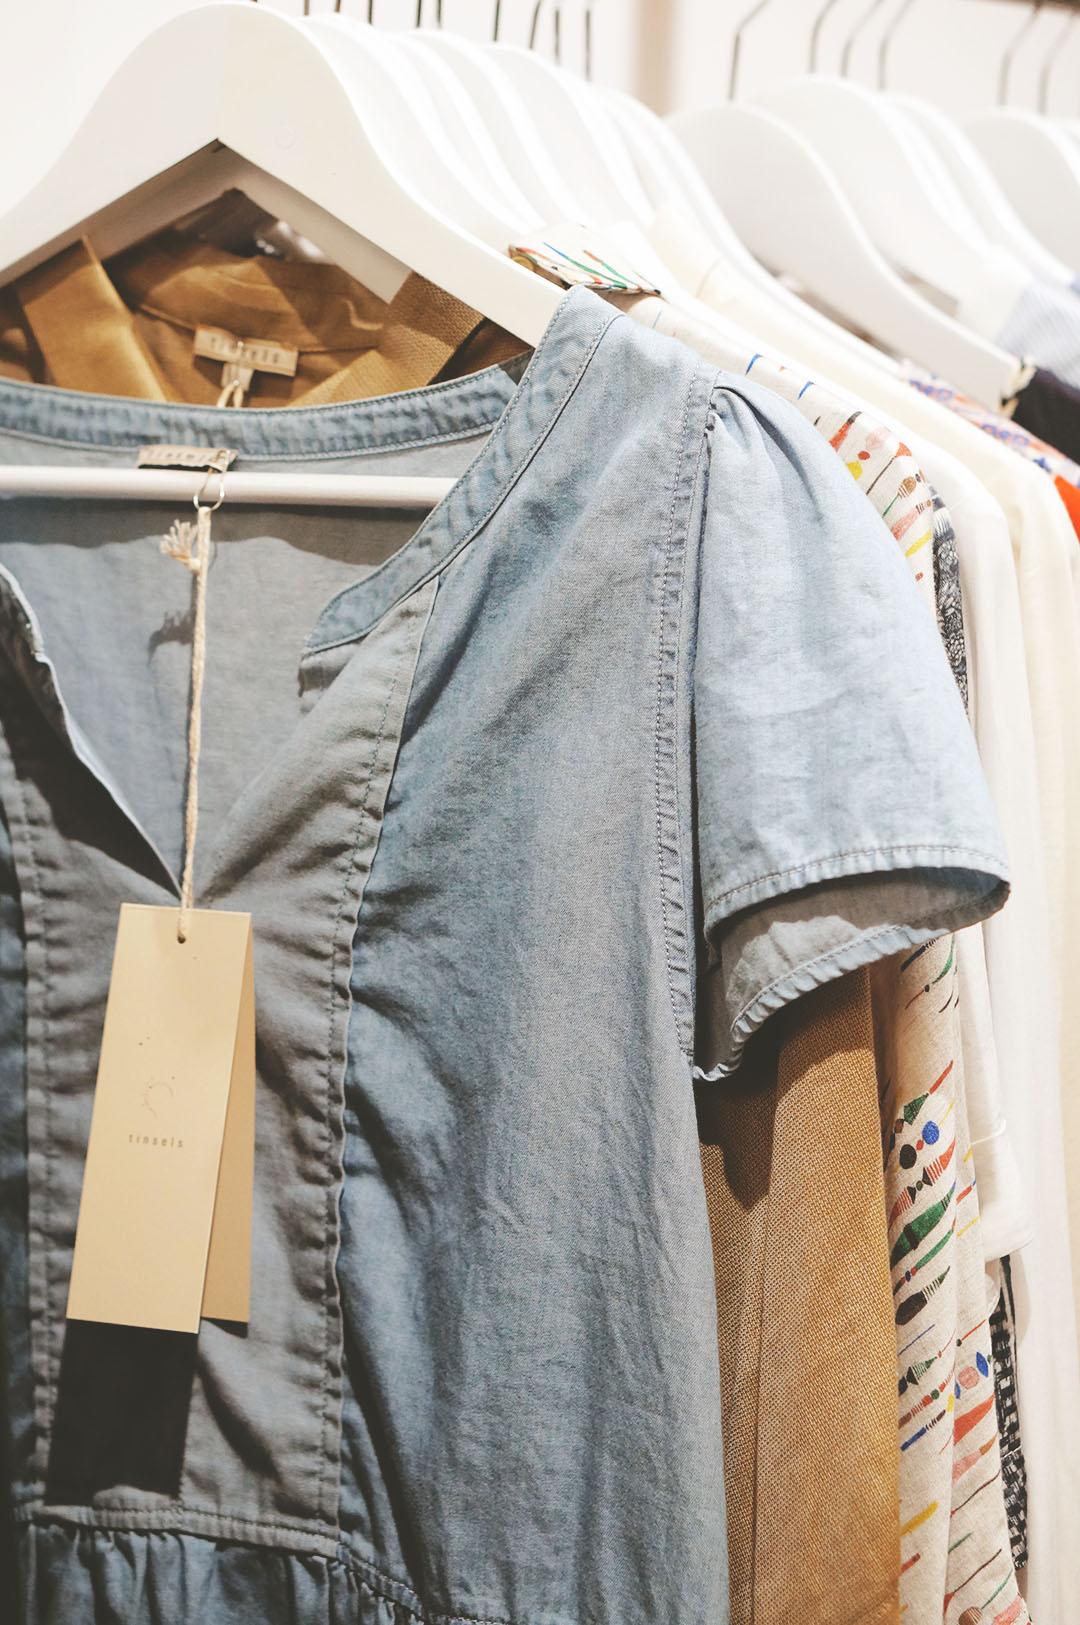 6_vente_privee_showroom_g2s_nantes_vide_dressing